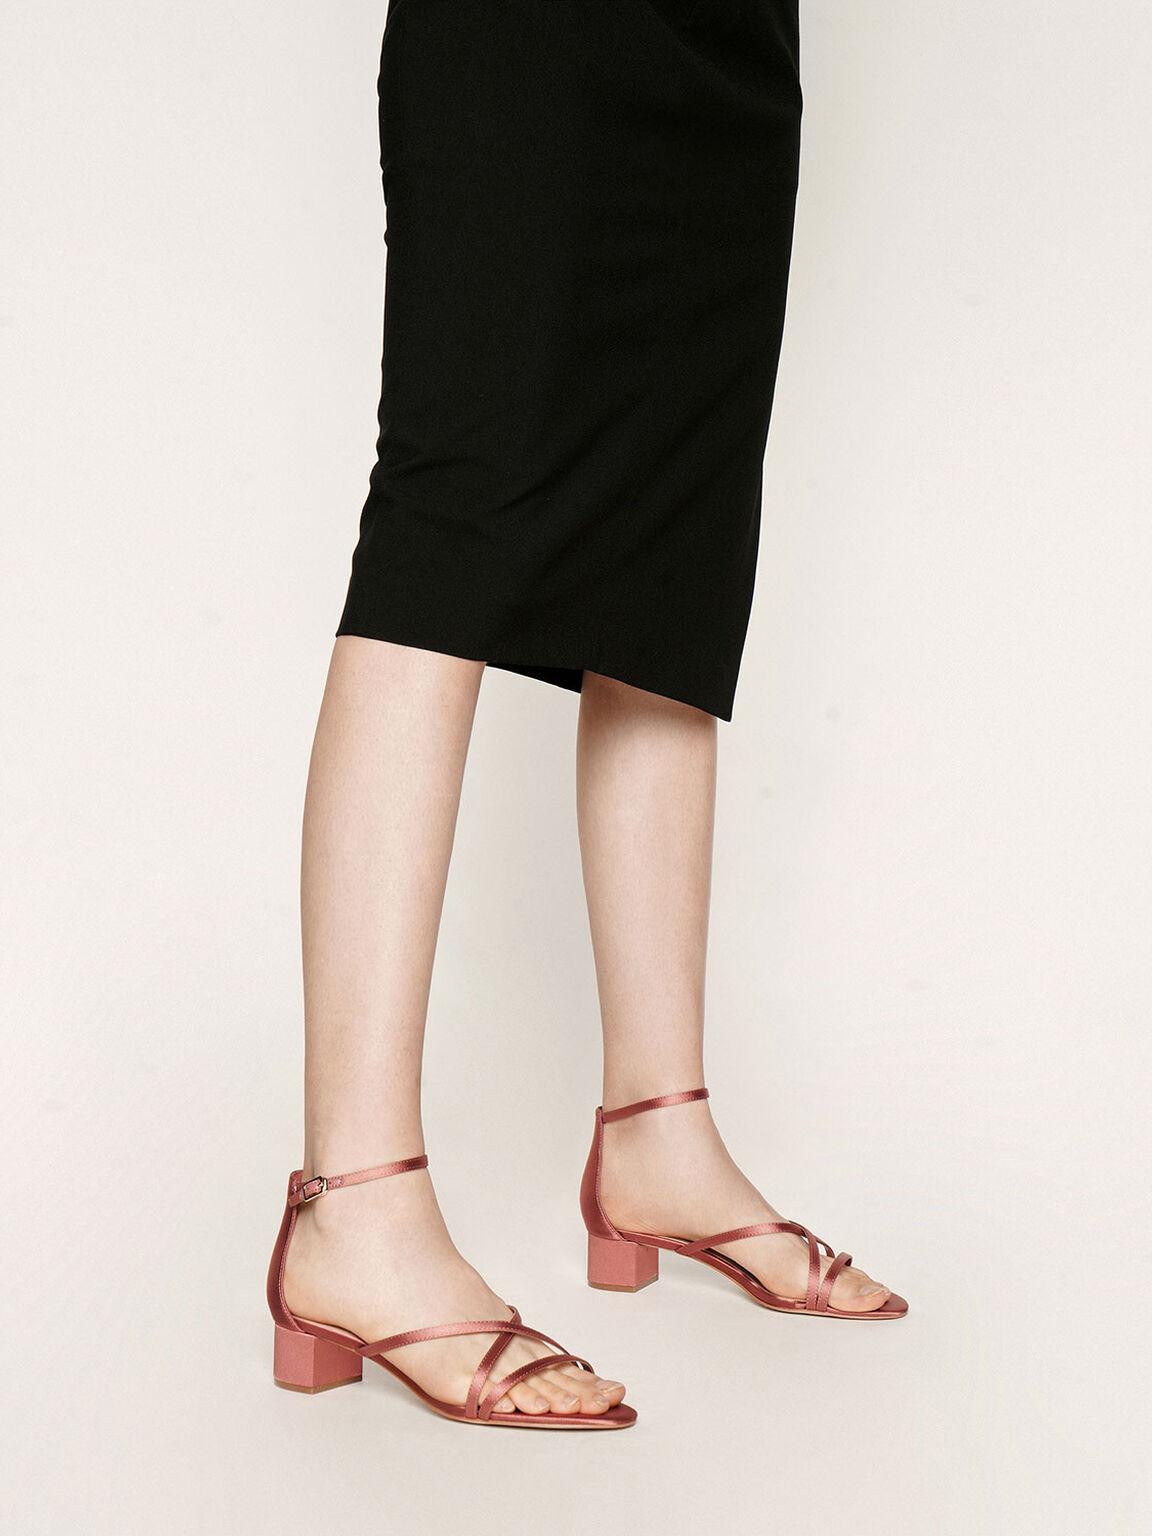 Satin Strappy Heeled Sandals, Pink, hi-res